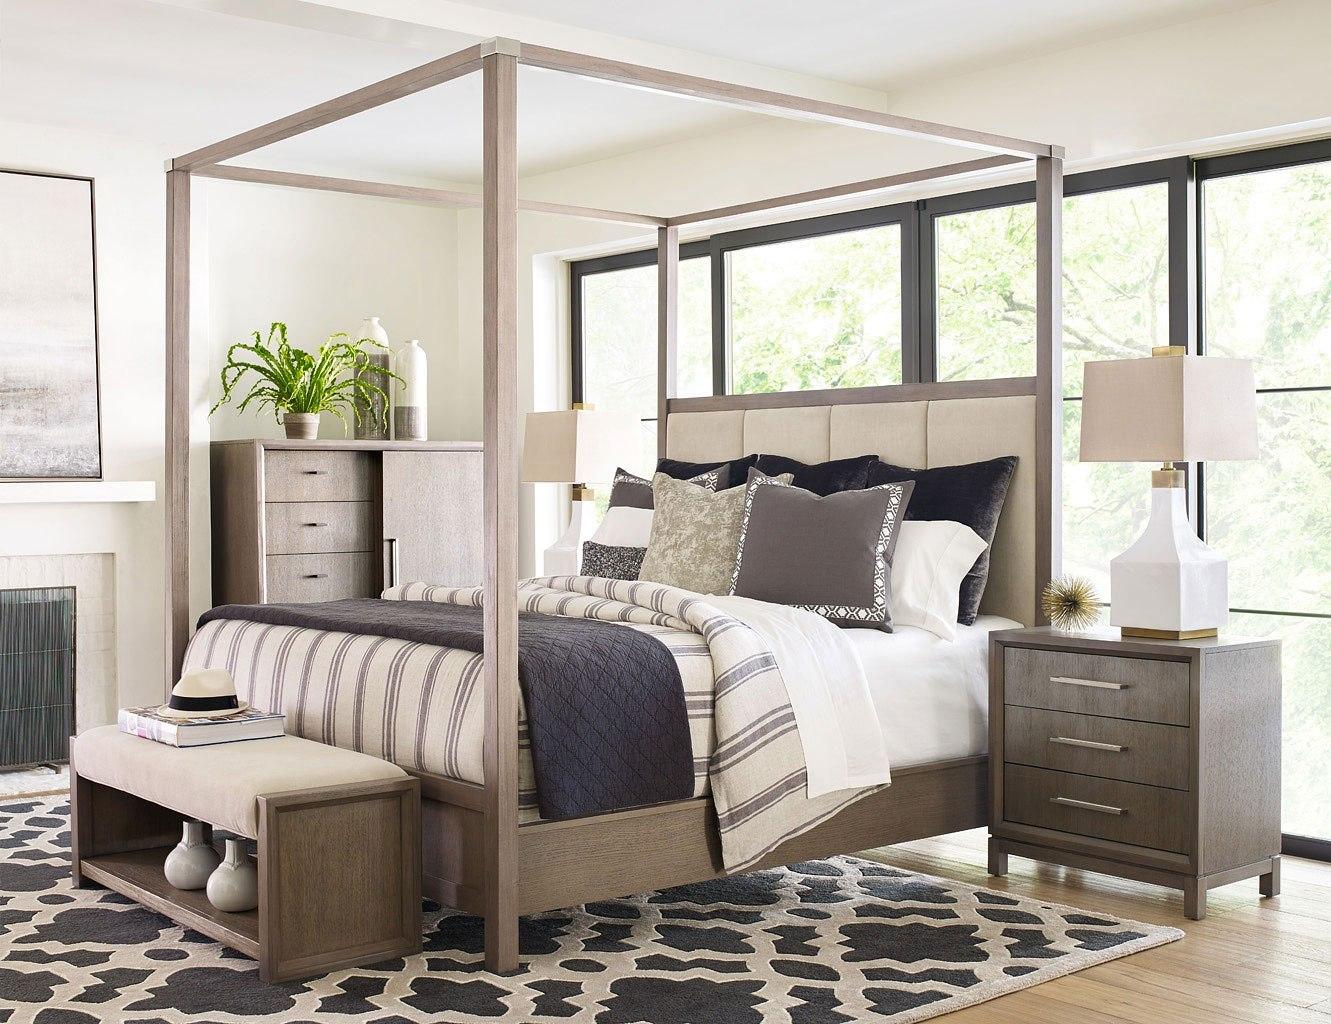 Delicieux Furniture Pick